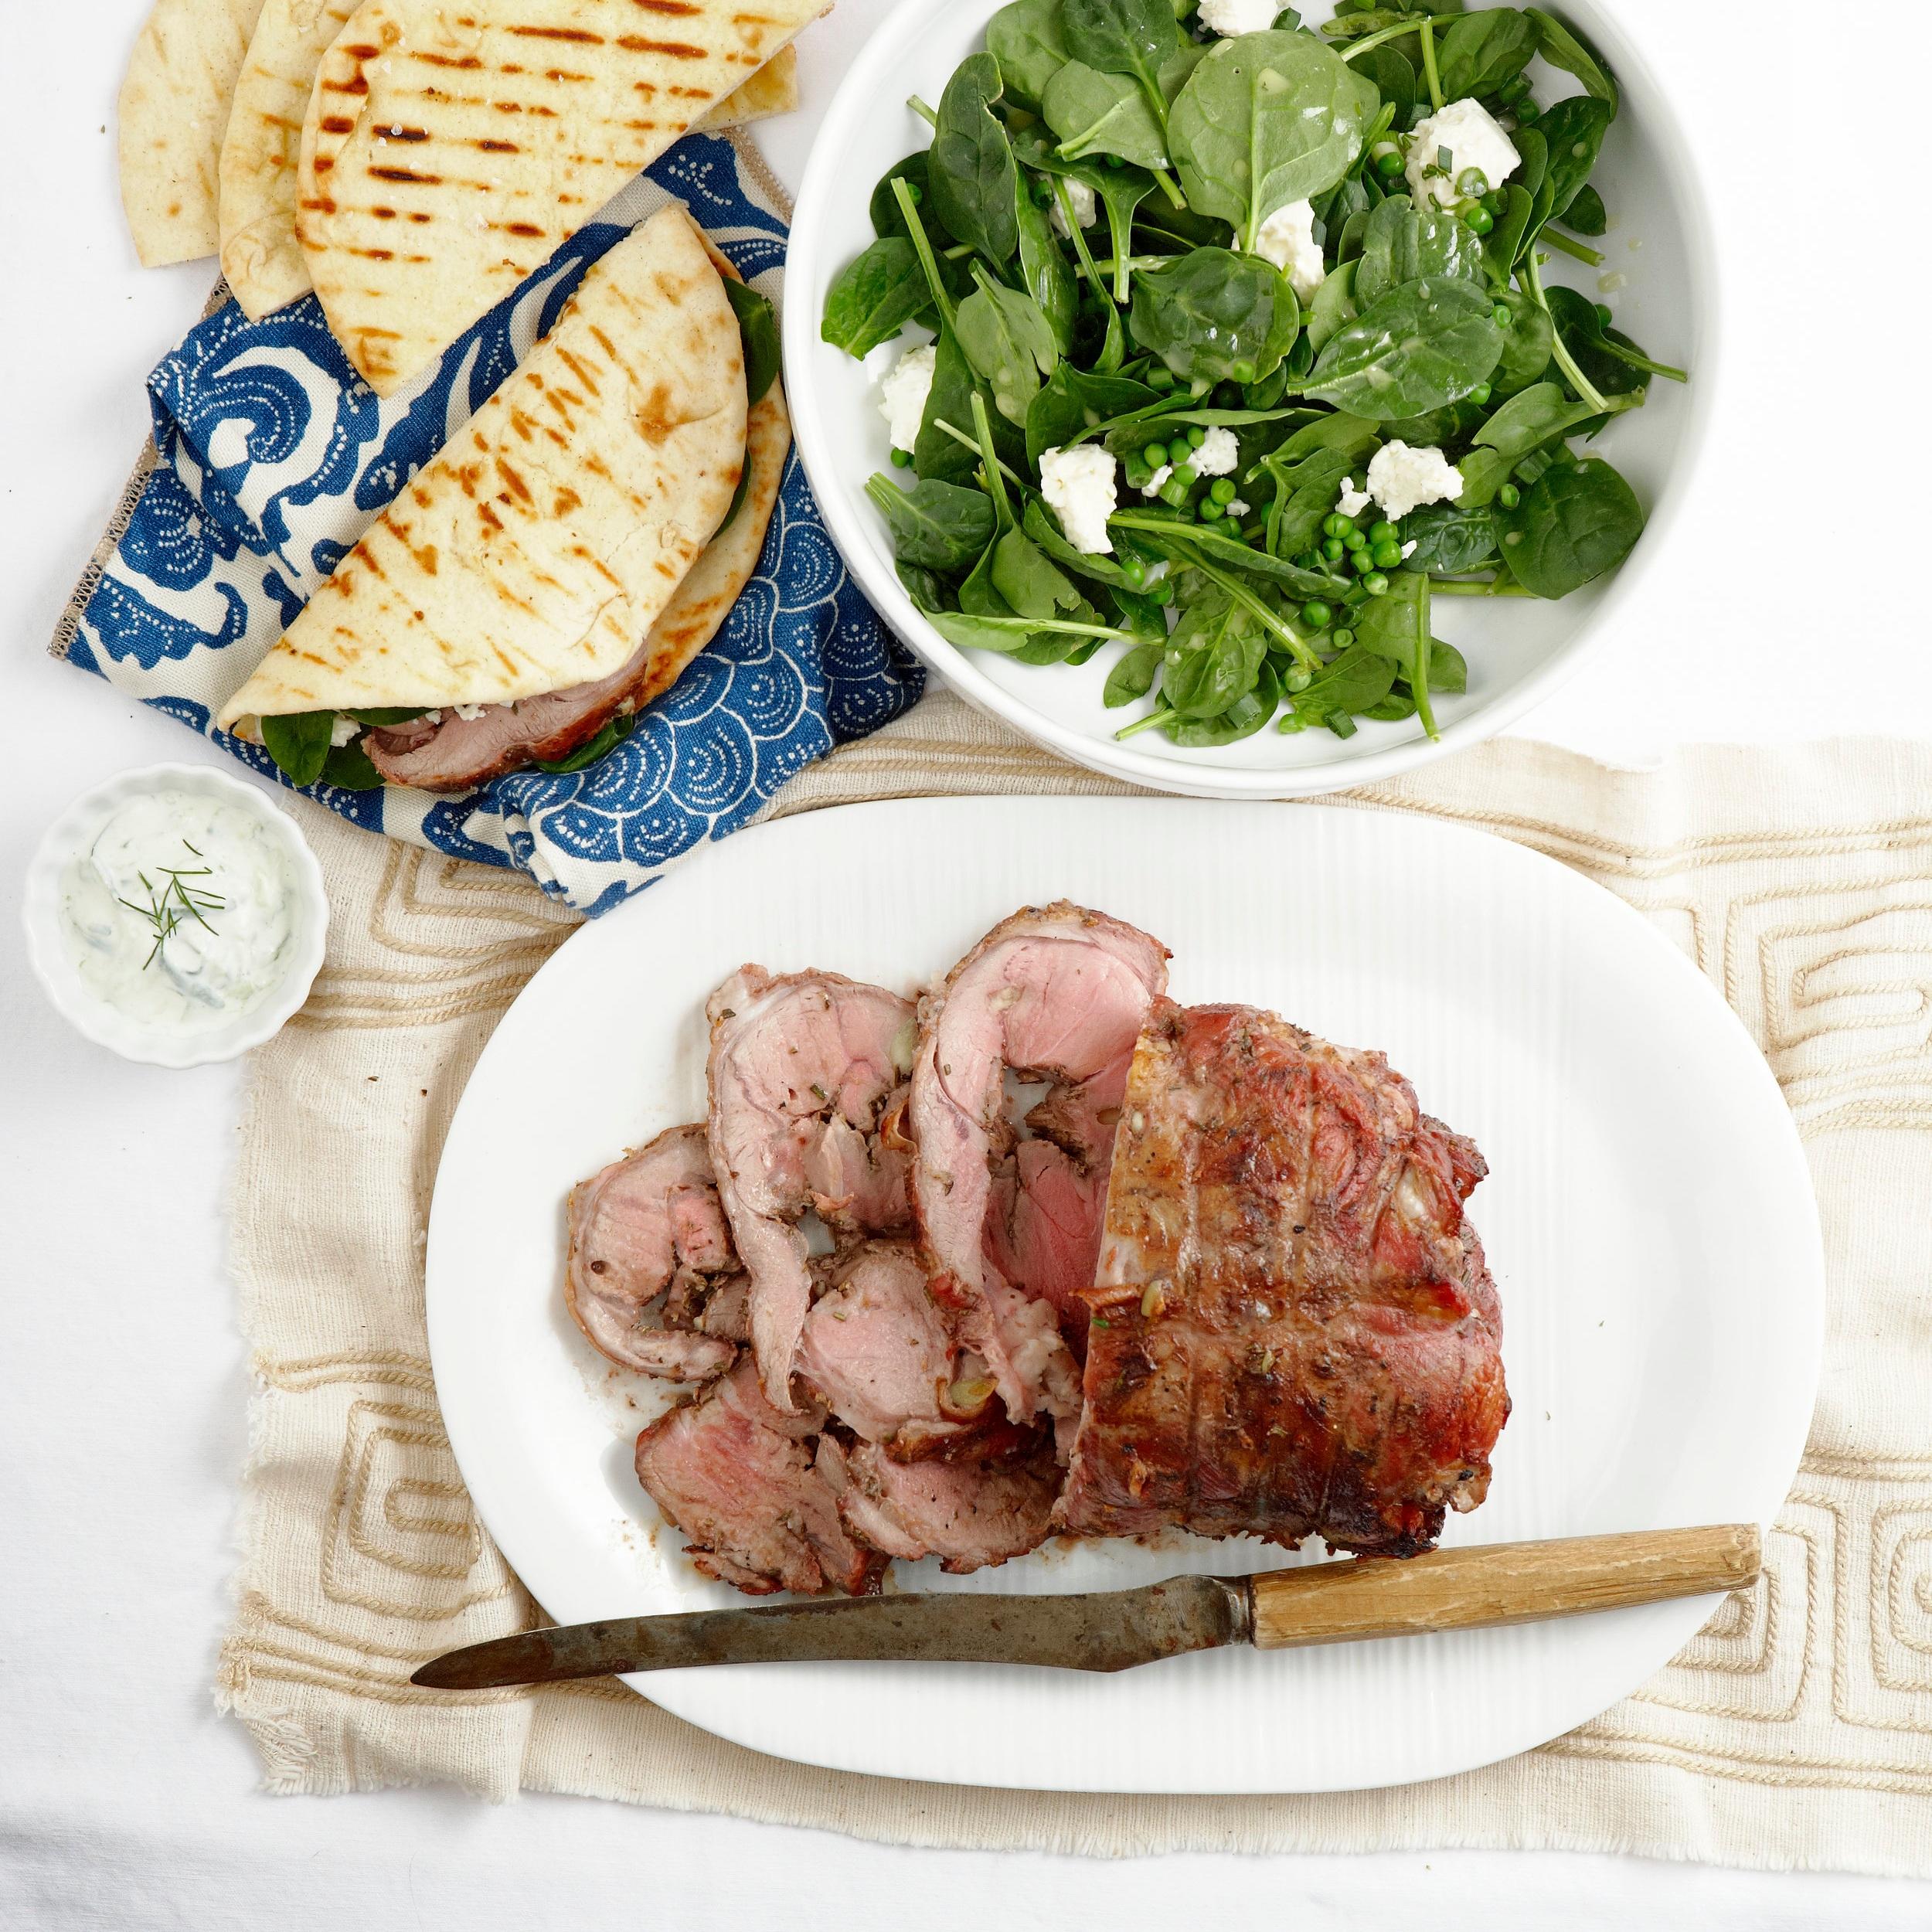 Greek lamb gyros with tzatziki and feta salad